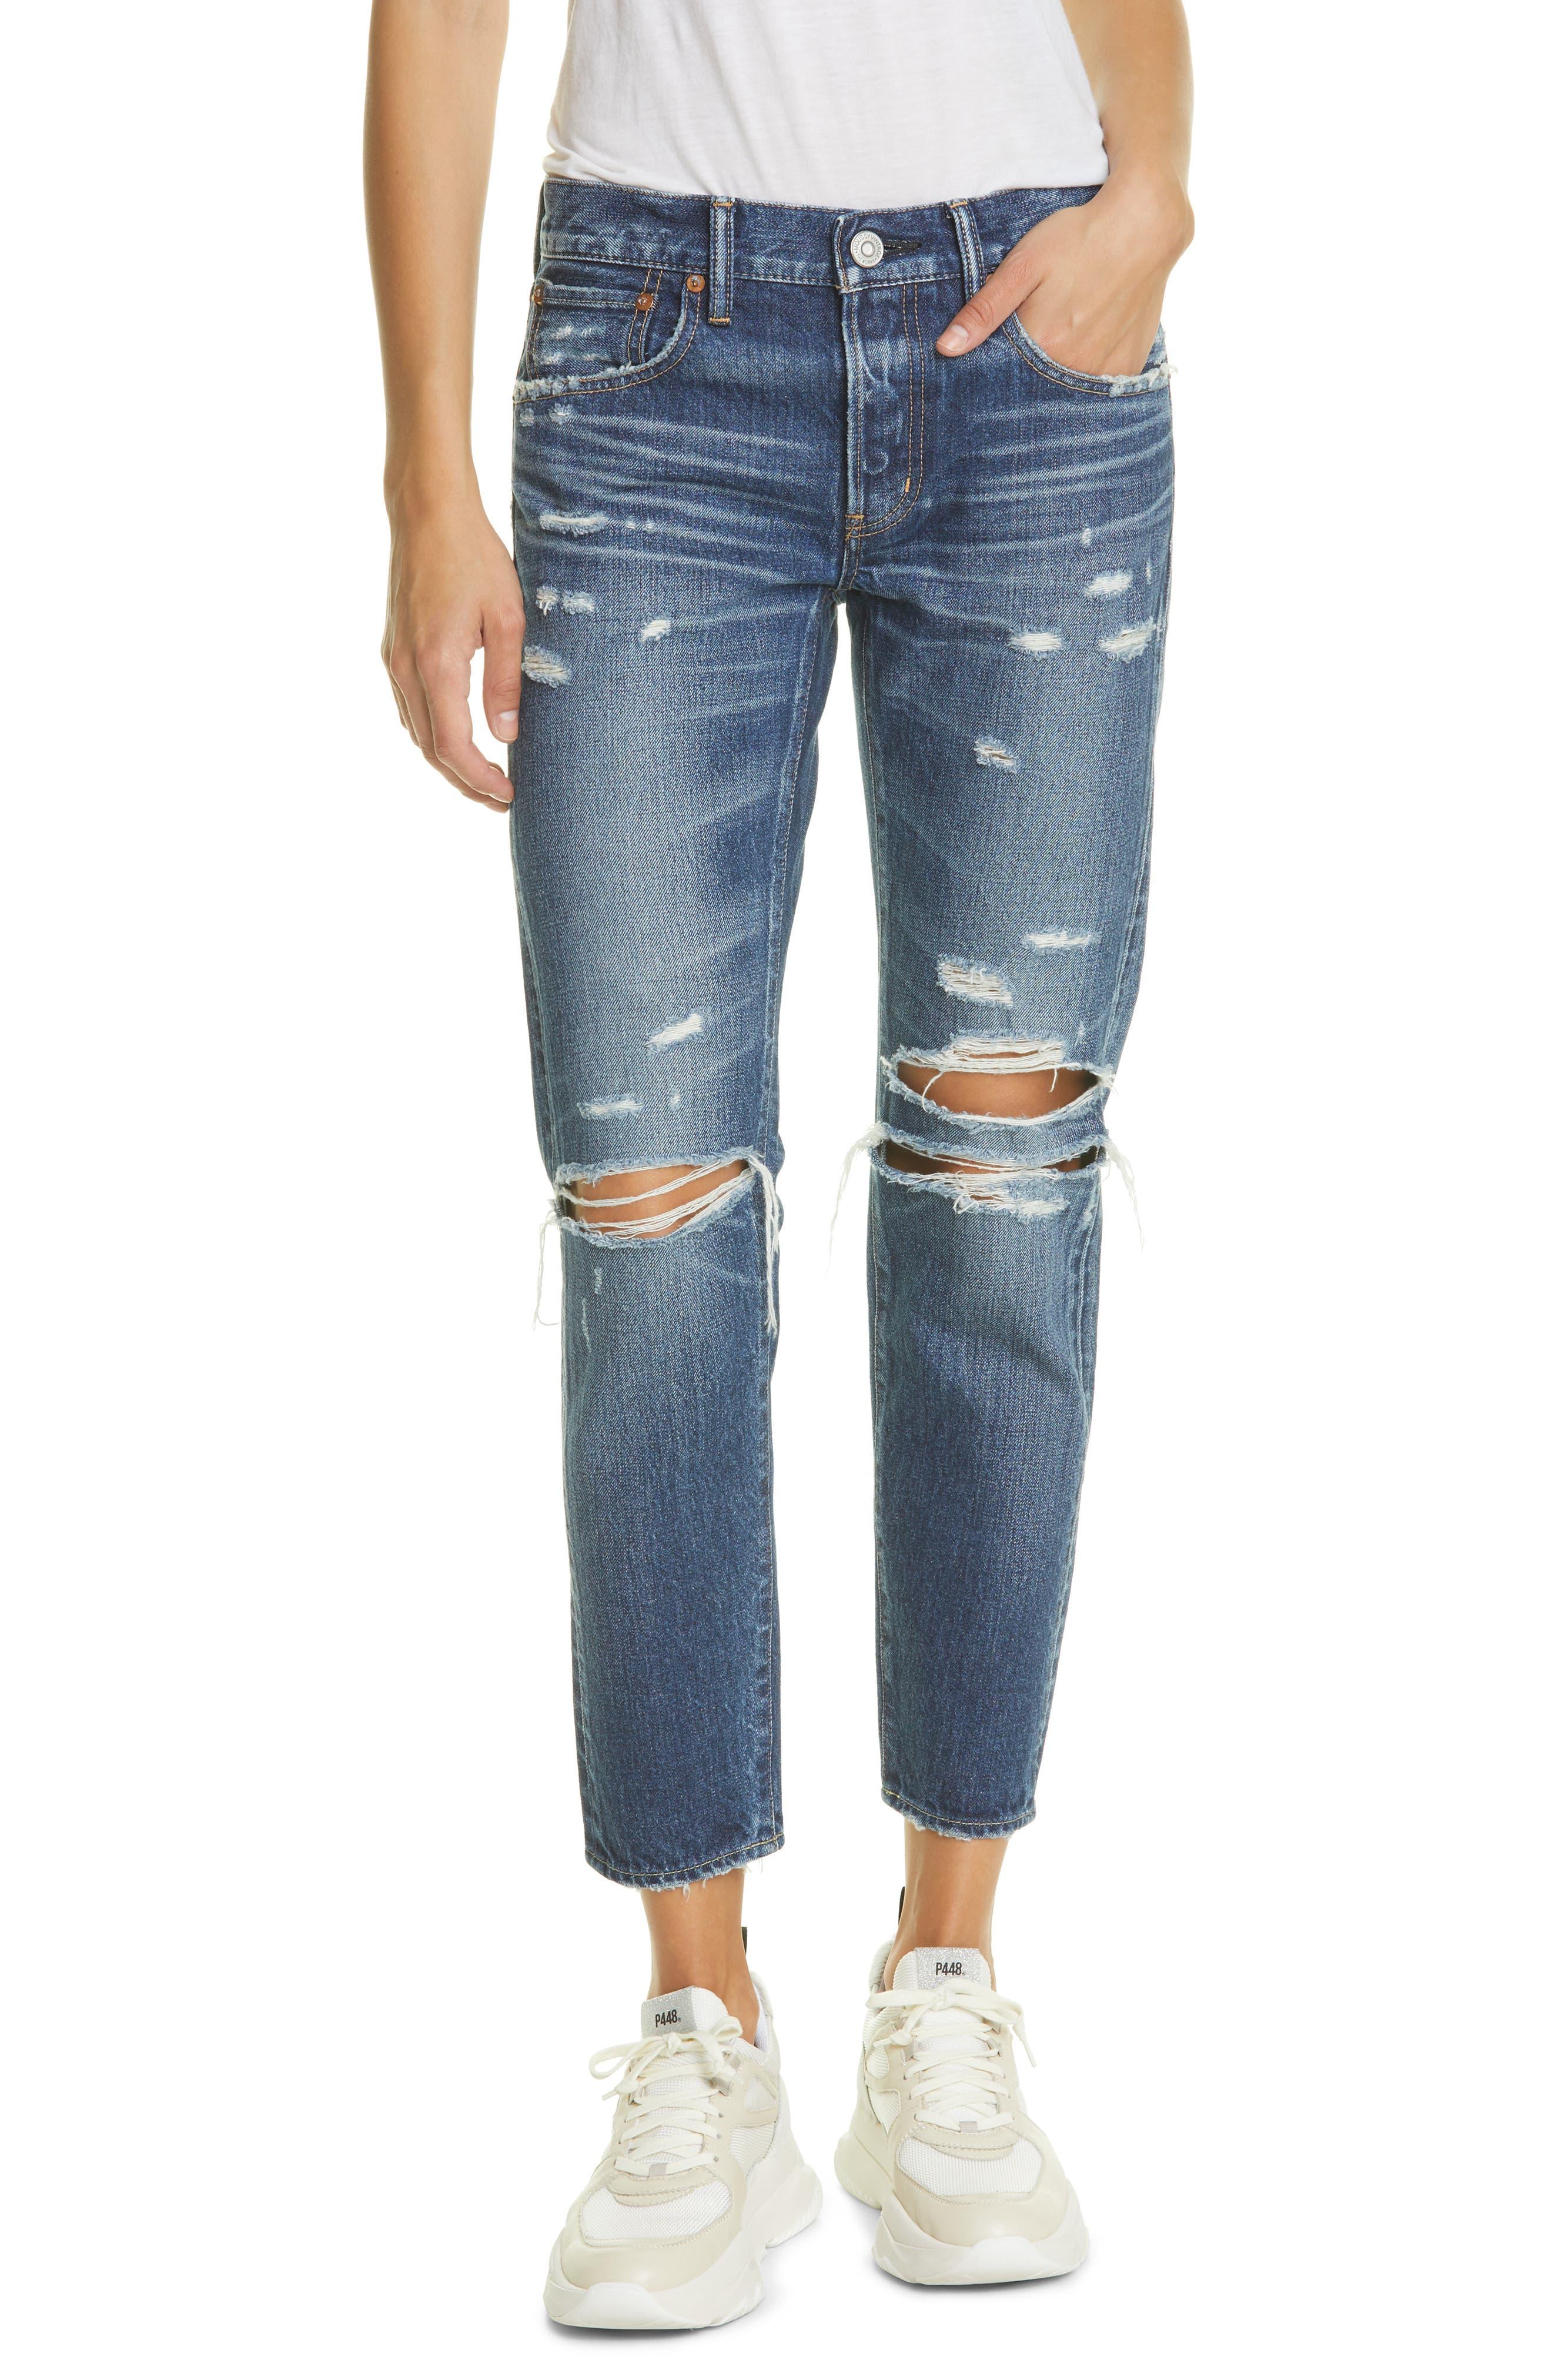 Denver Distressed Tapered Ankle Jeans